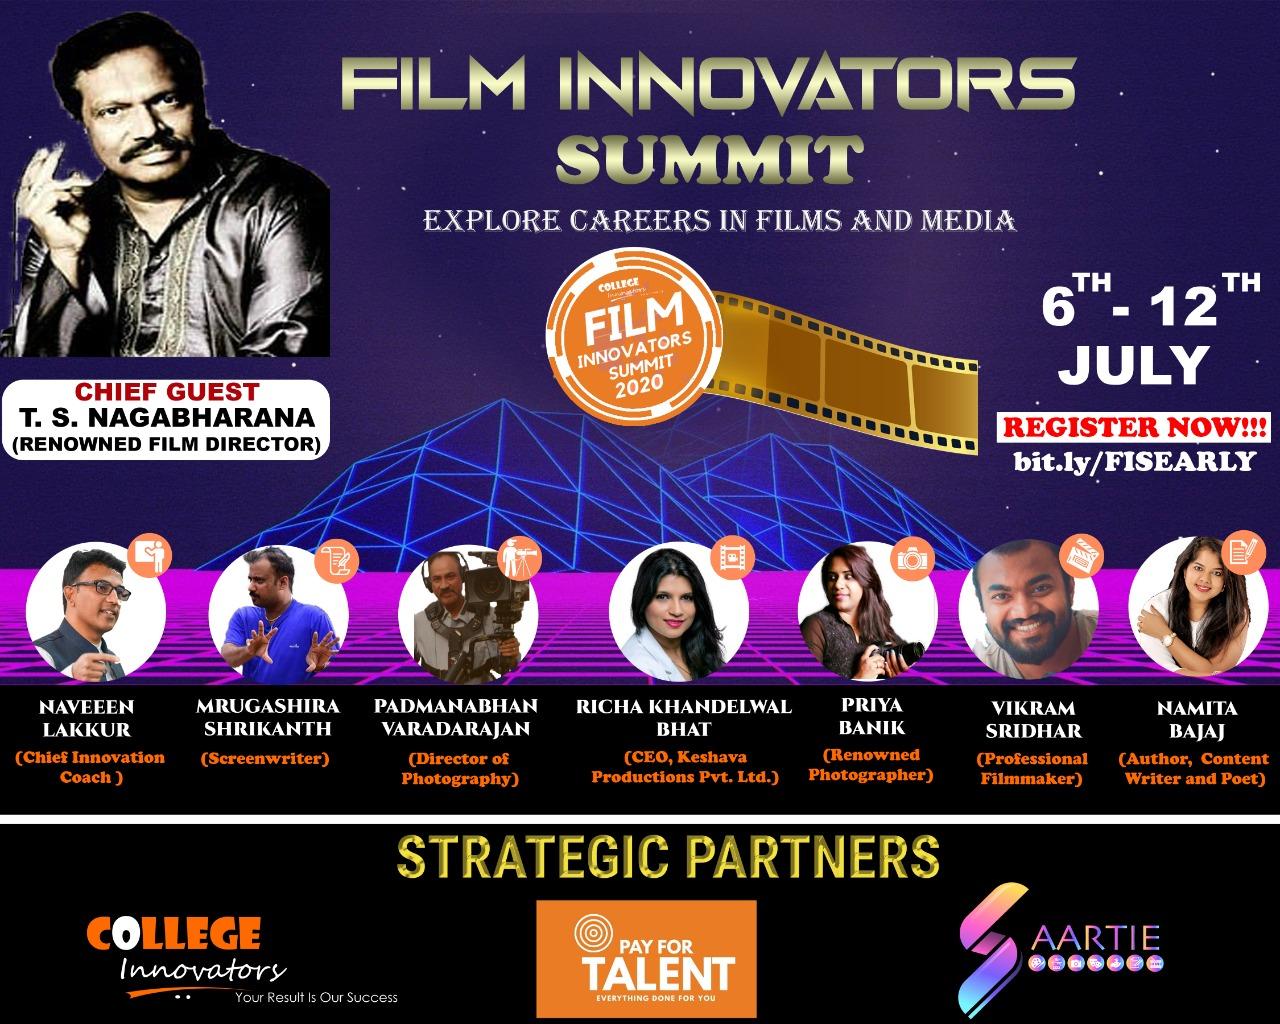 Creativity & Technology to Power Film Innovators